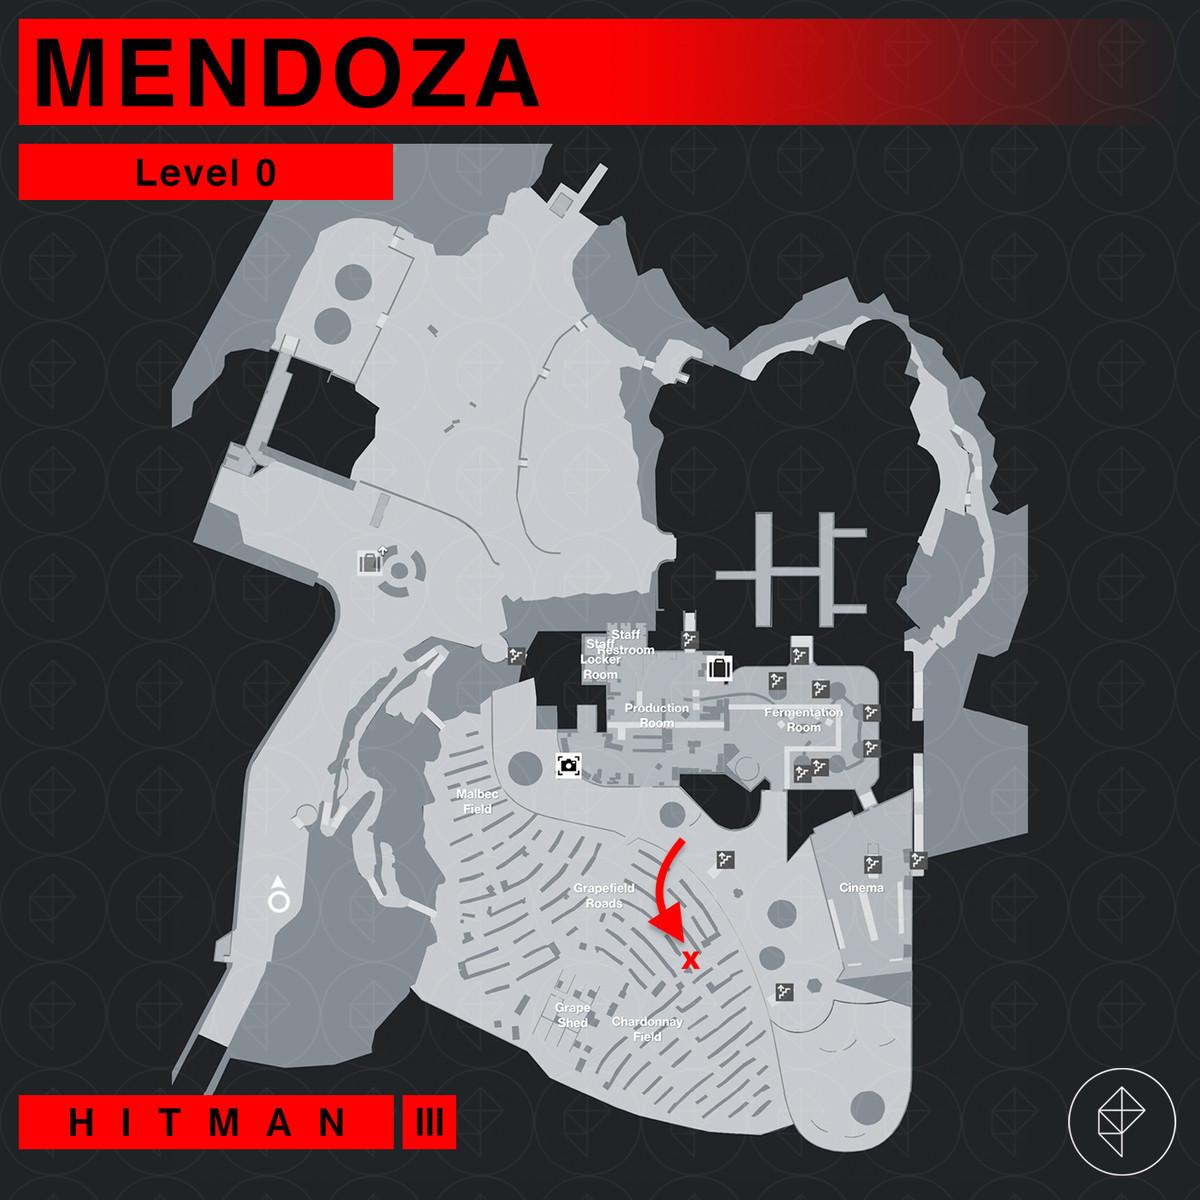 Hitman 3 Mendoza The Farewell The Tour Mission Story walkthrough